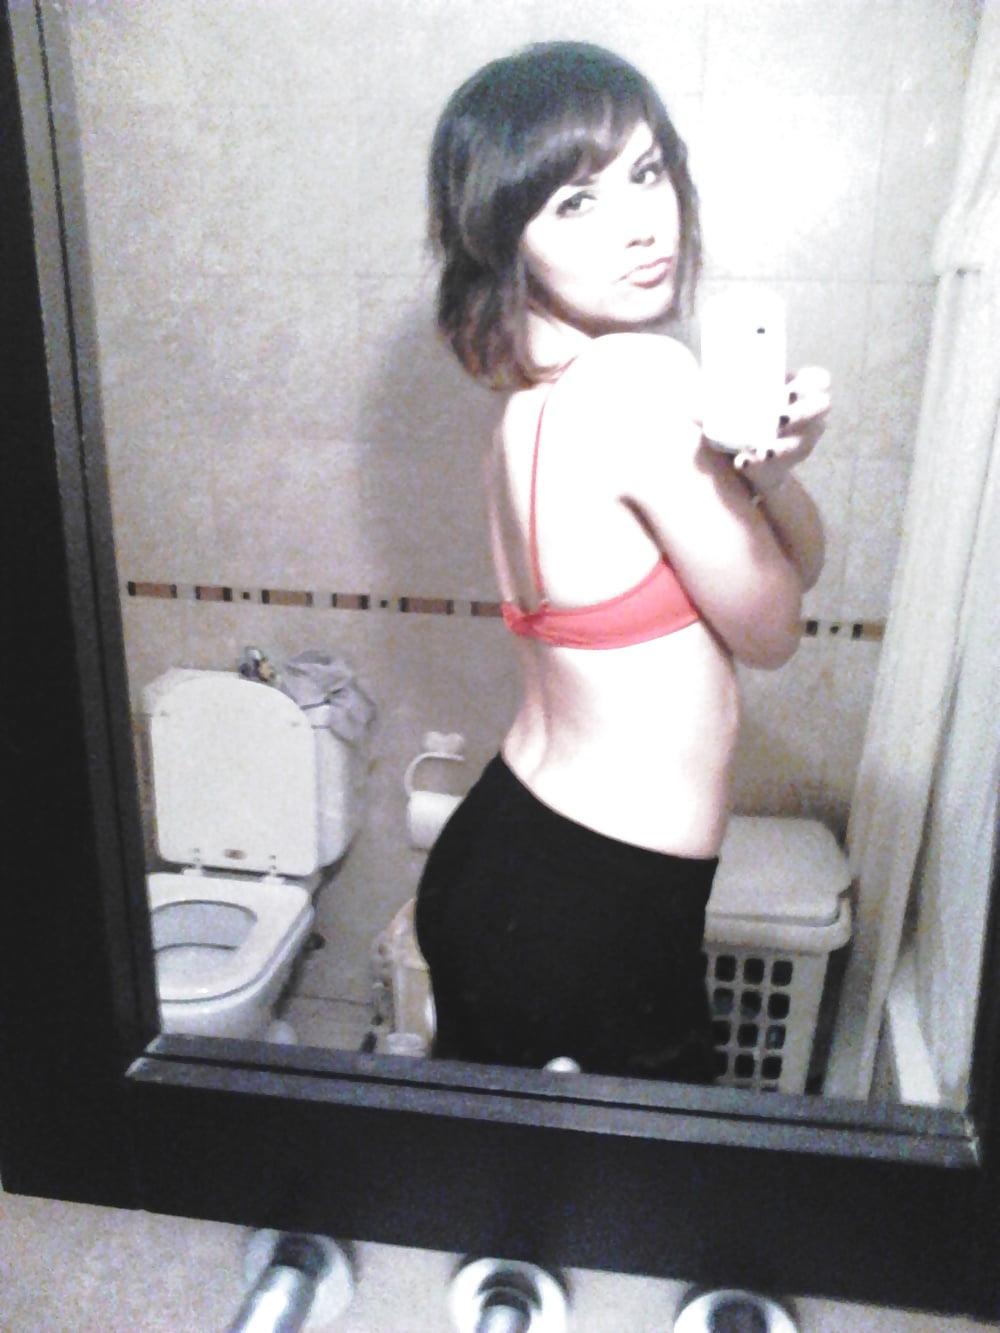 Argentina Porno Paula see and save as paula gomez dirty slut whore from argentina